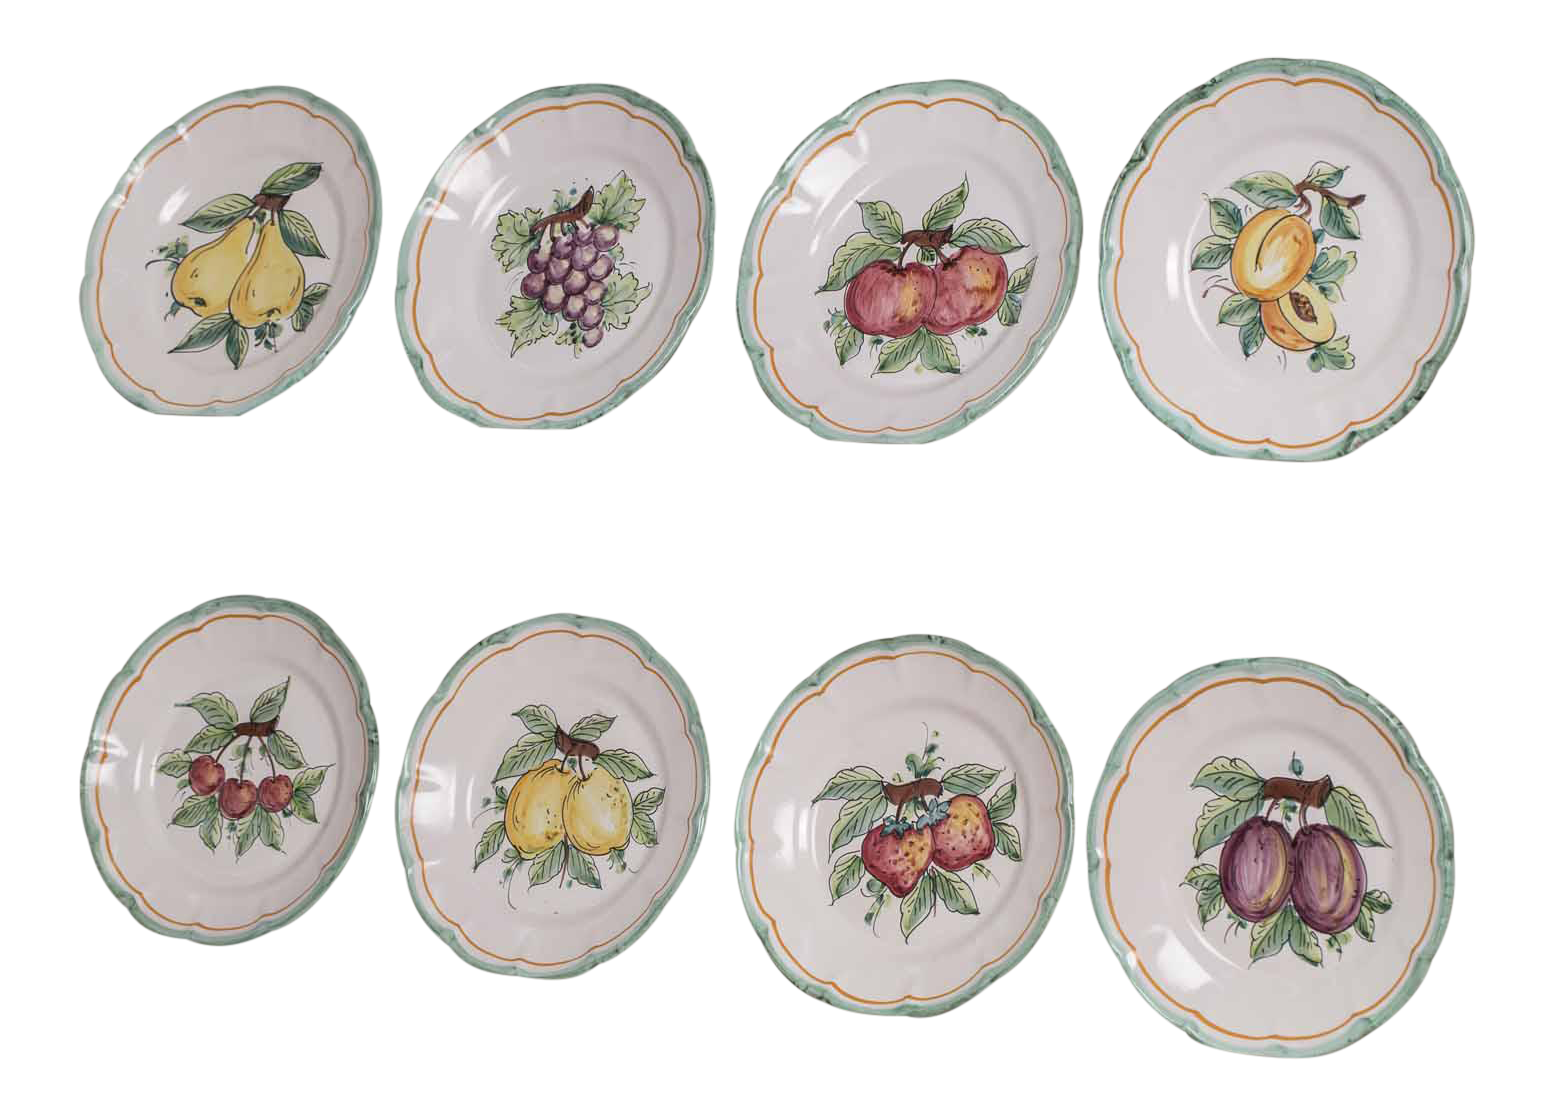 Set Eight Italian Hand Painted Dinner Plates Vietri - Image 1 of 11  sc 1 st  Decaso & World-Class Set Eight Italian Hand Painted Dinner Plates Vietri ...